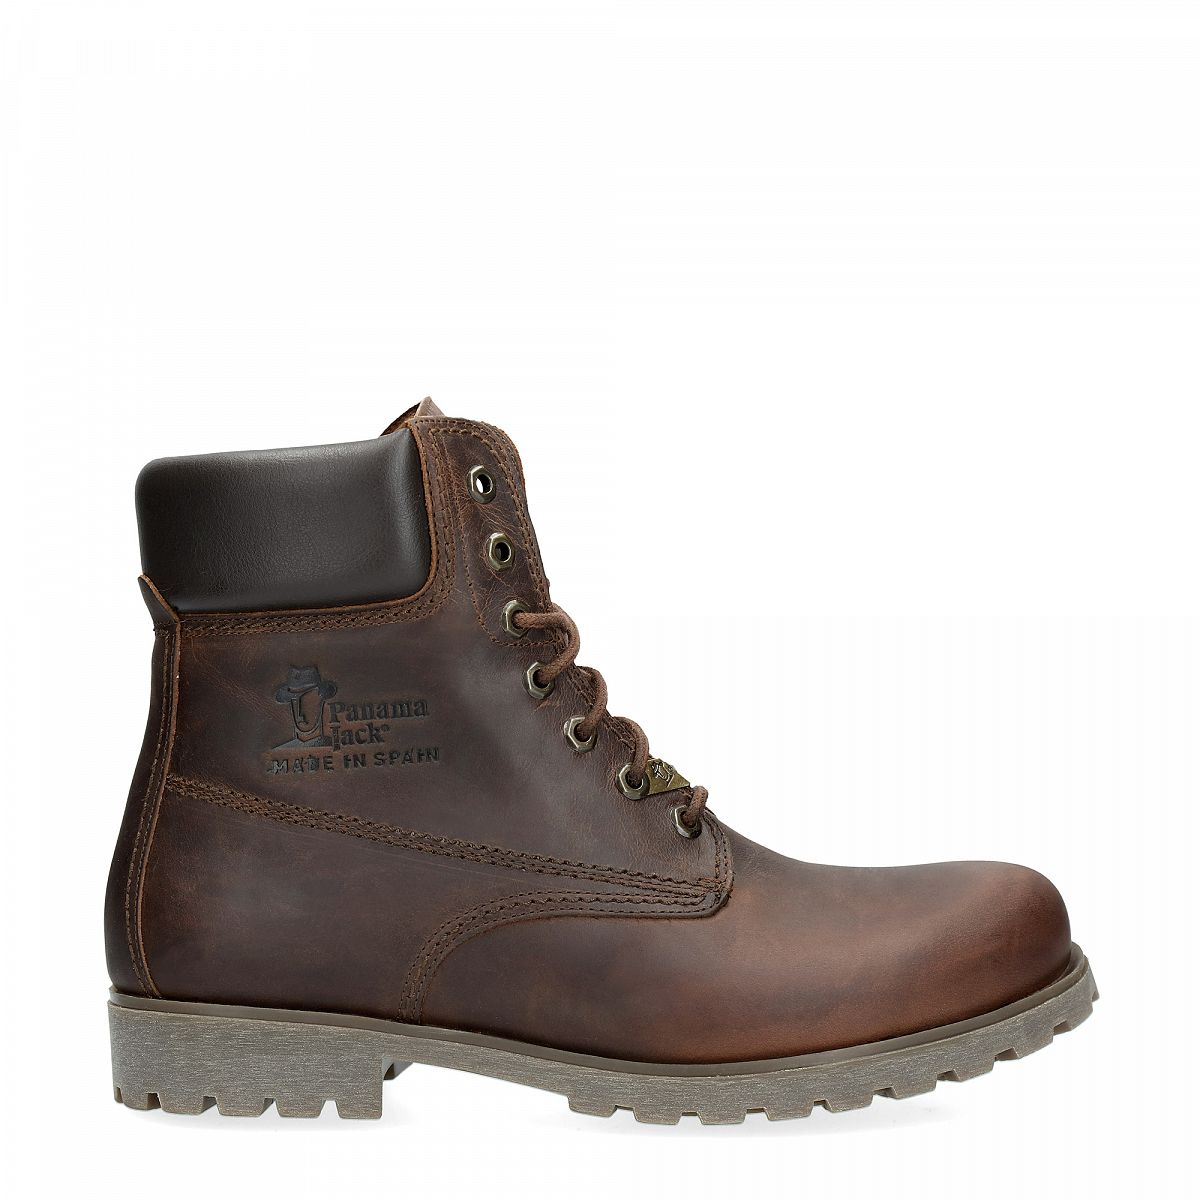 dcd4f068 Men's boot PANAMA 03 natural | PANAMA JACK® Official store